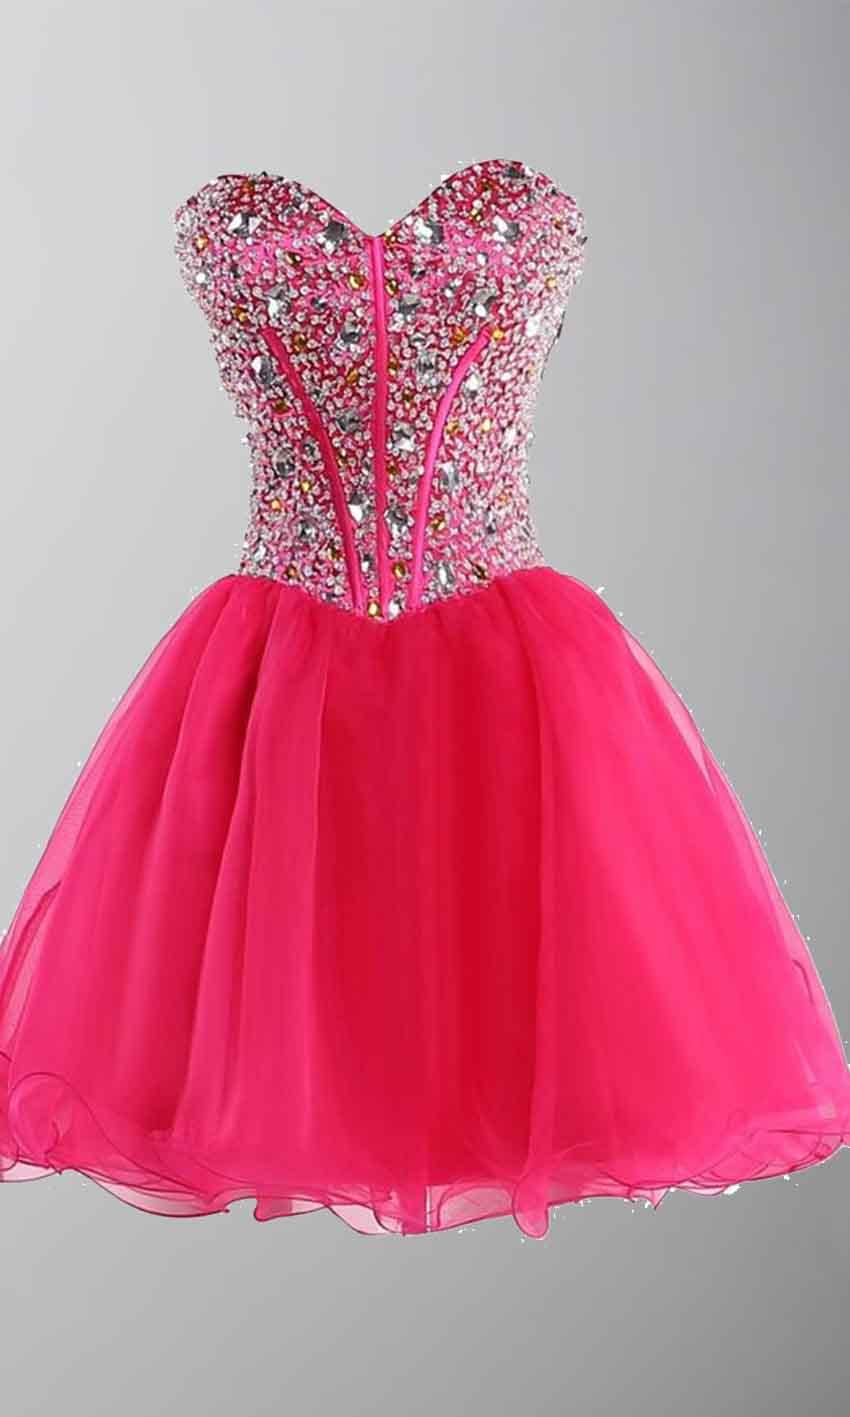 Rhinestone Sweetheart Bodice Short Red Prom Dresses UK KSP403 ...